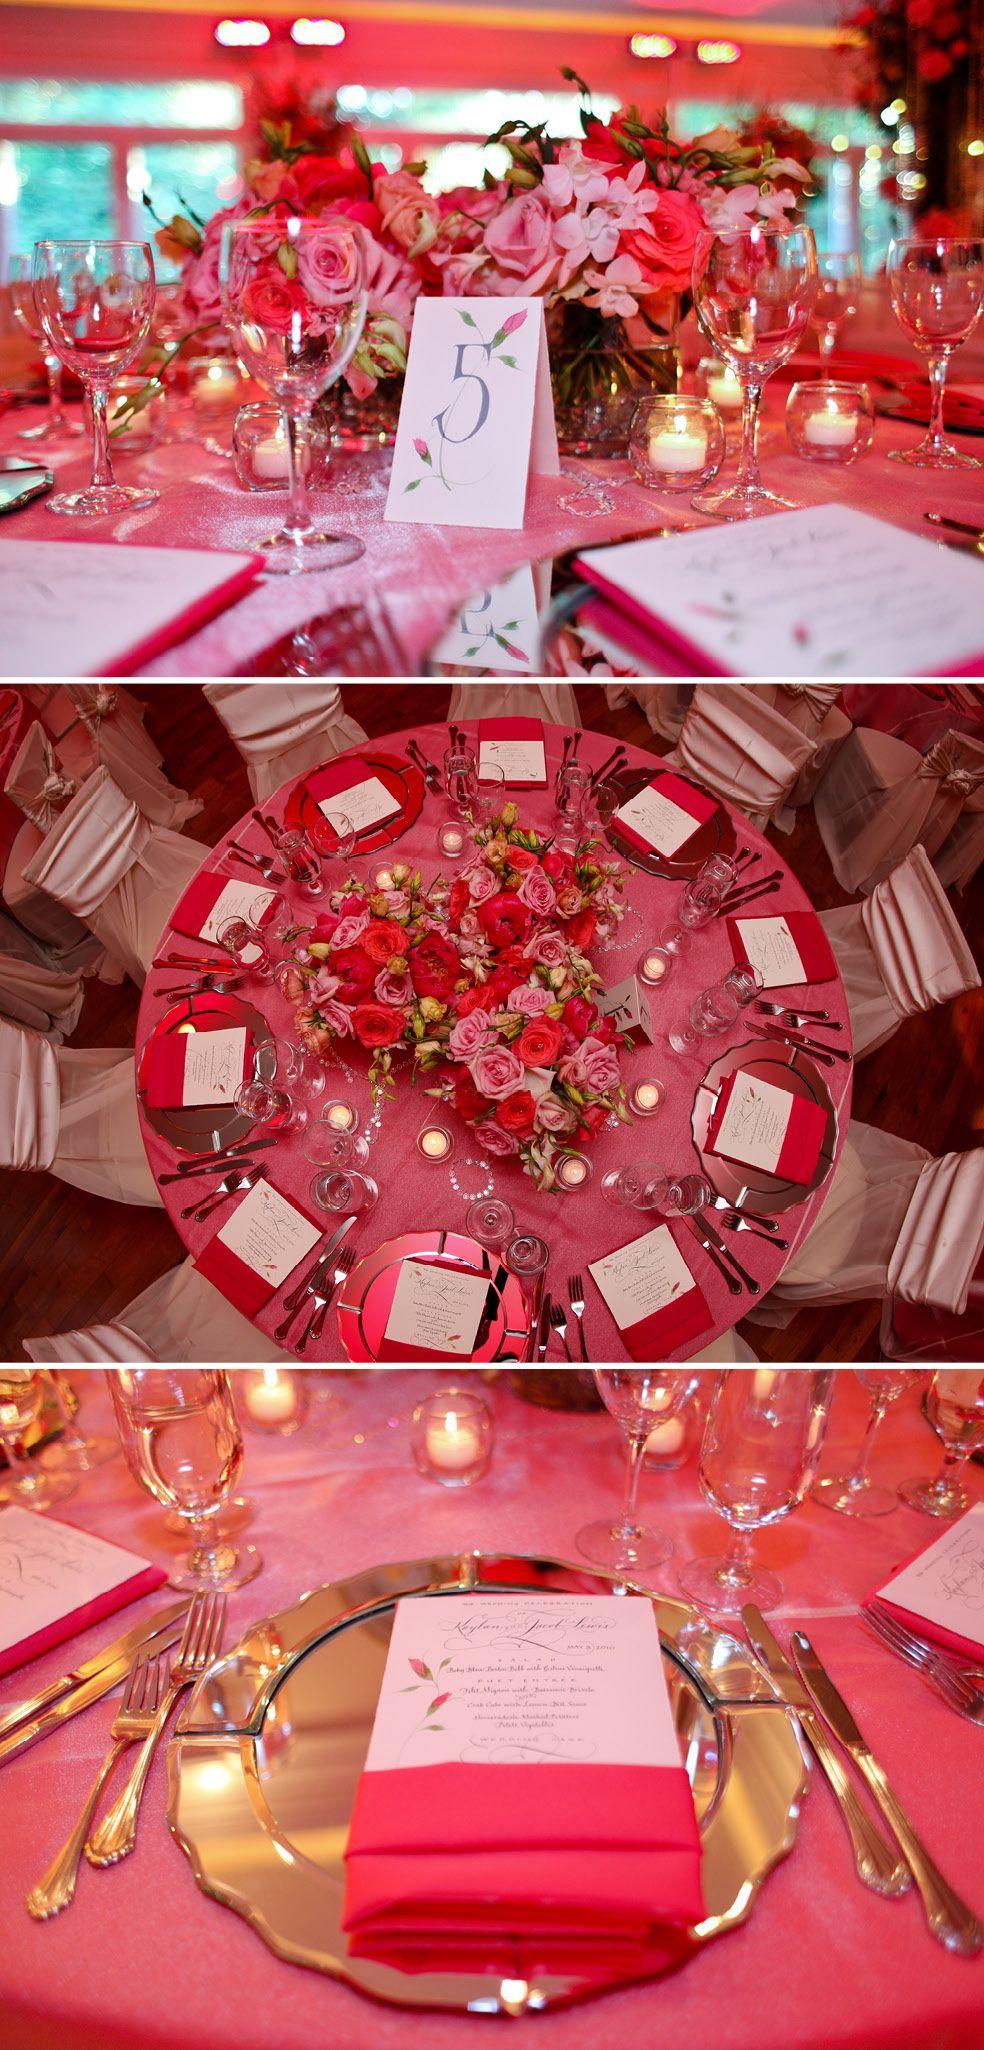 primrose-cottage-wedding-reception-pink-floral-centerpieces-table ...